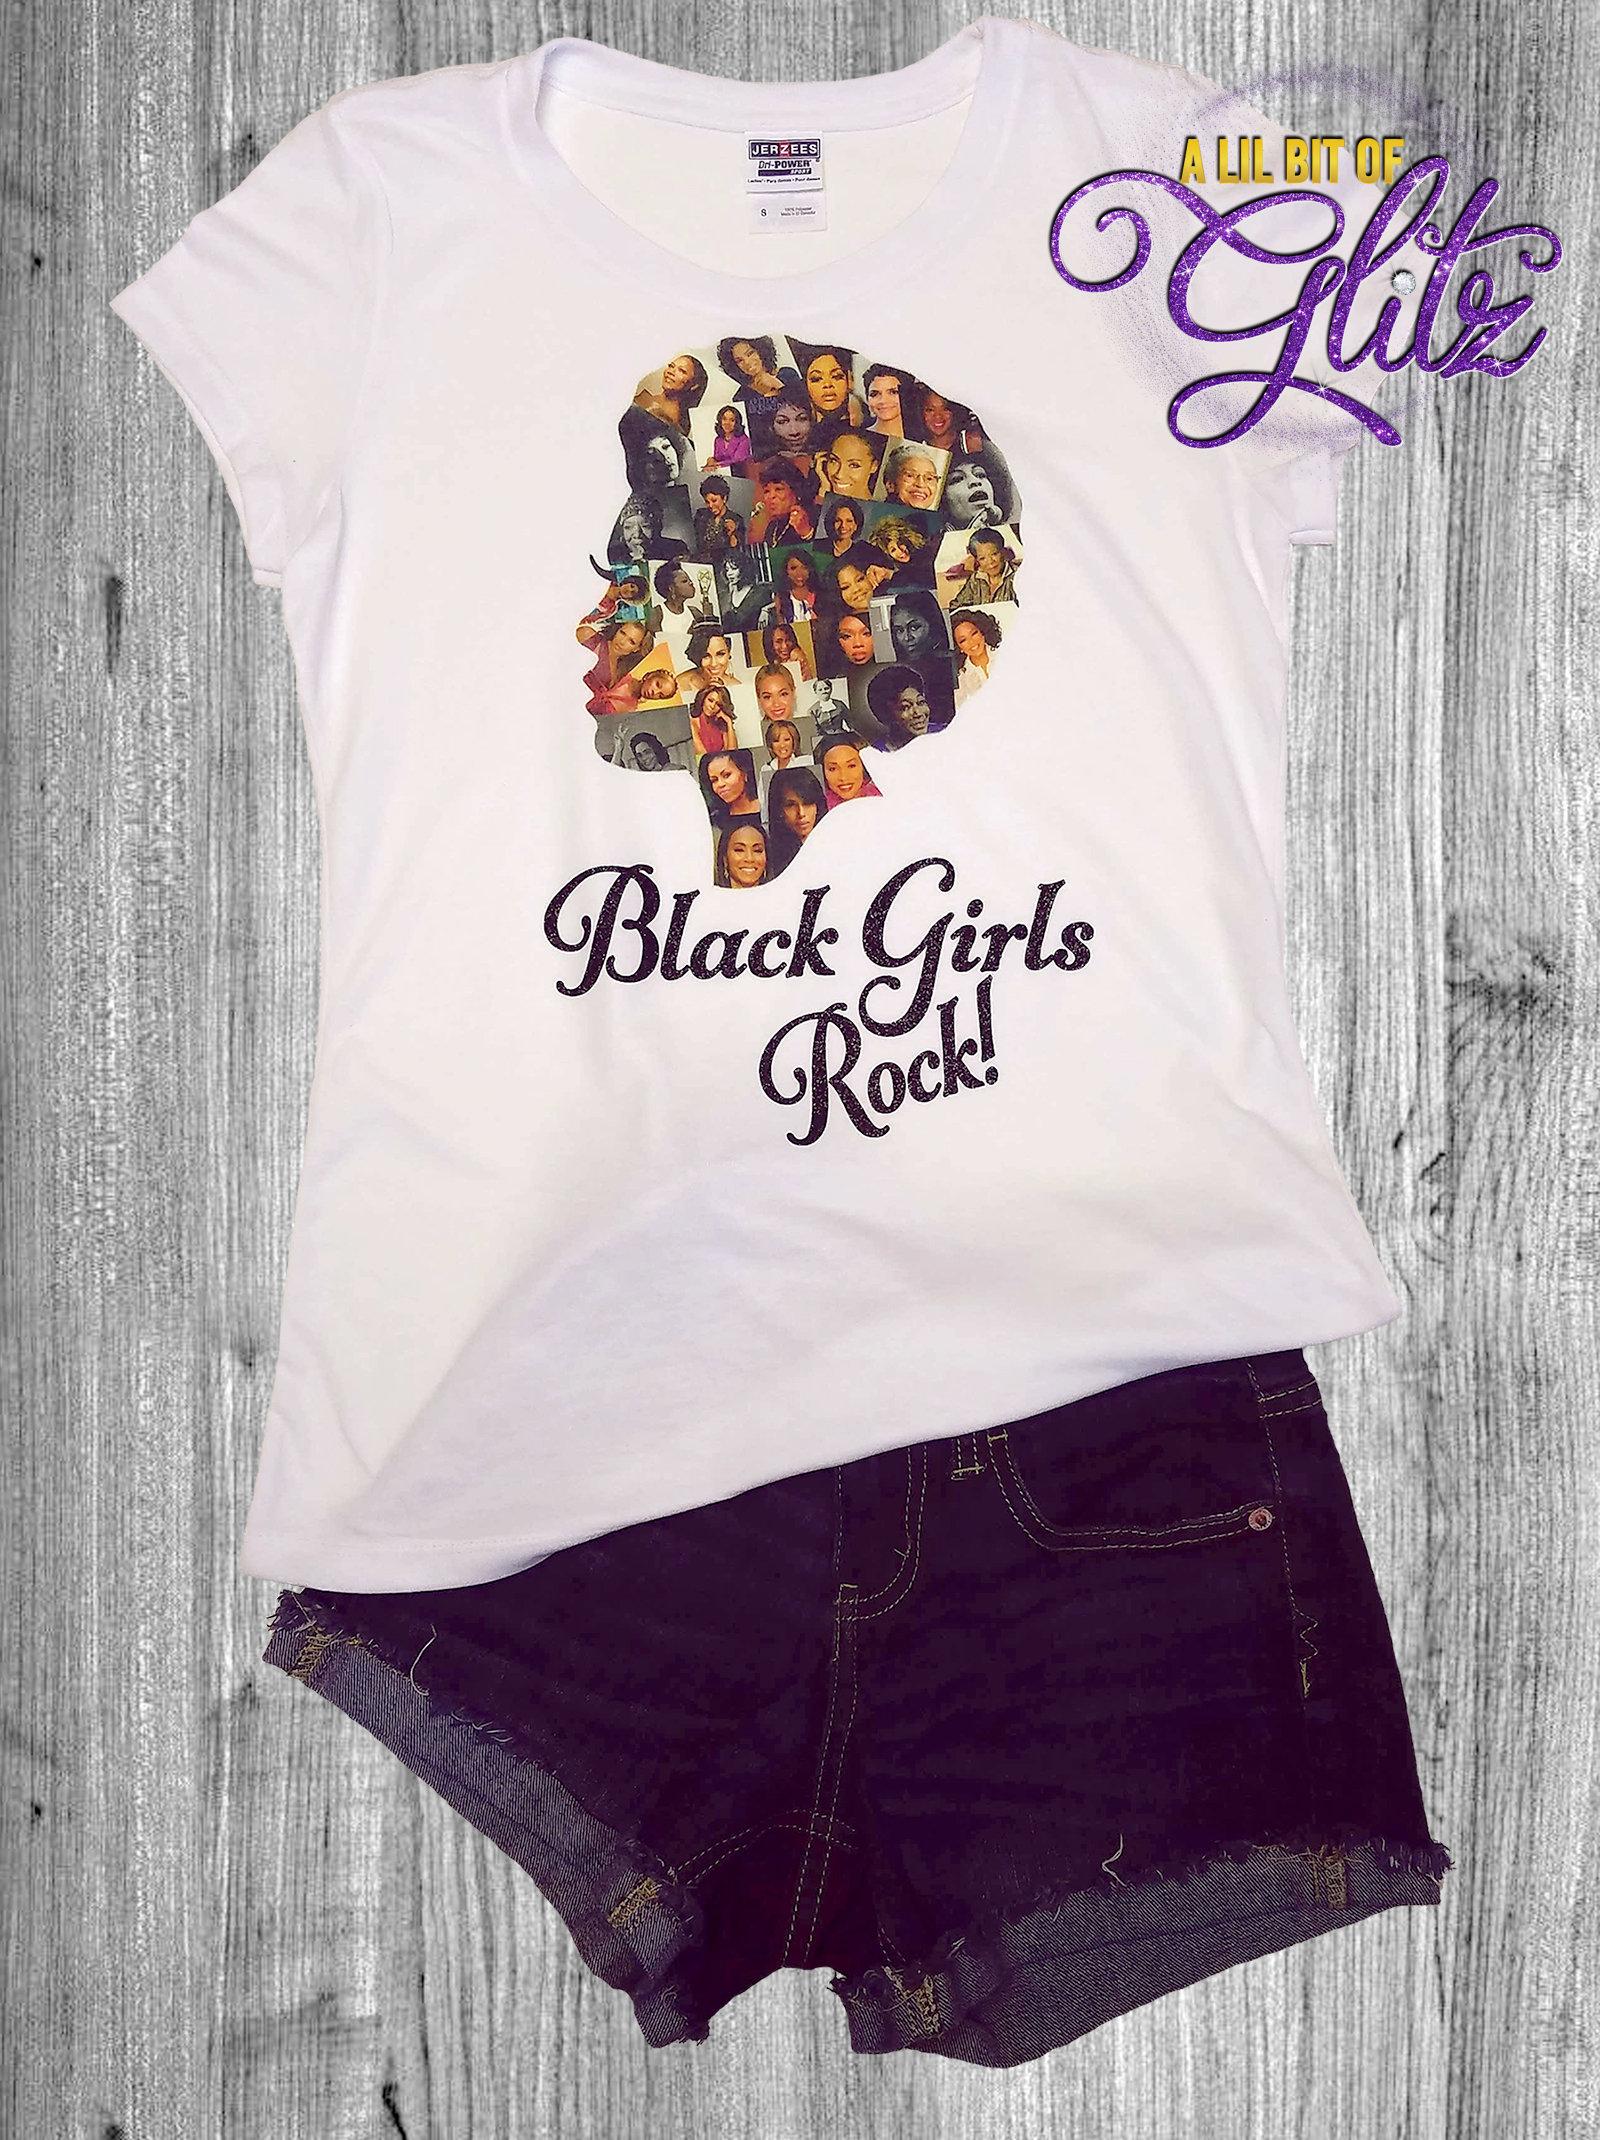 Black Girls Rock T-Shirt - Black Girl Magic Tee Shirt - African American  Females ~ White Shirt ~ Affluent African Americans